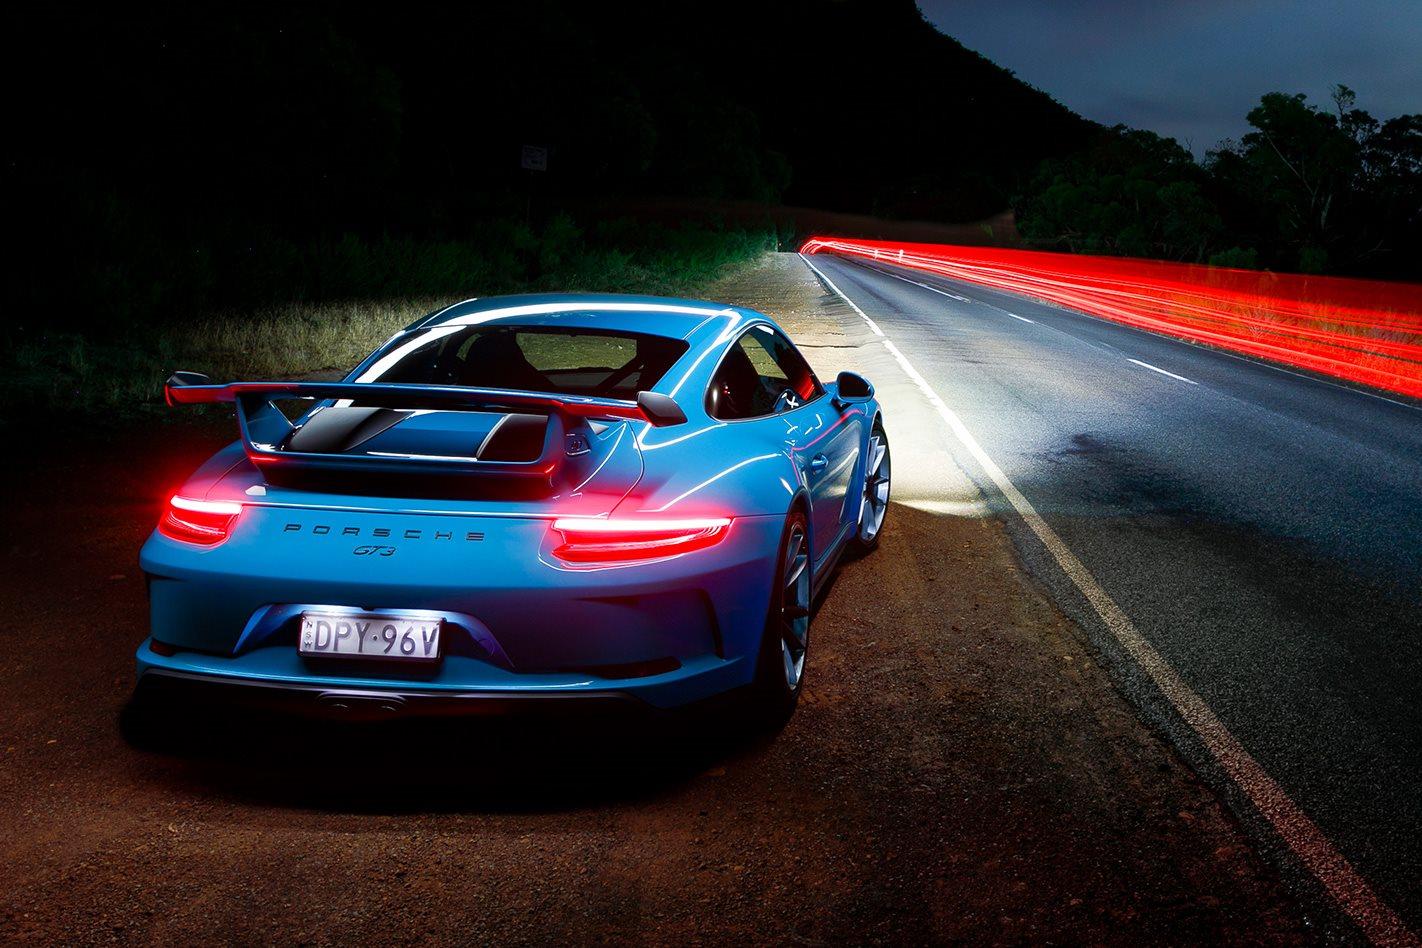 Porsche 911 Gt3 Review Video 20 Years Of Gt3